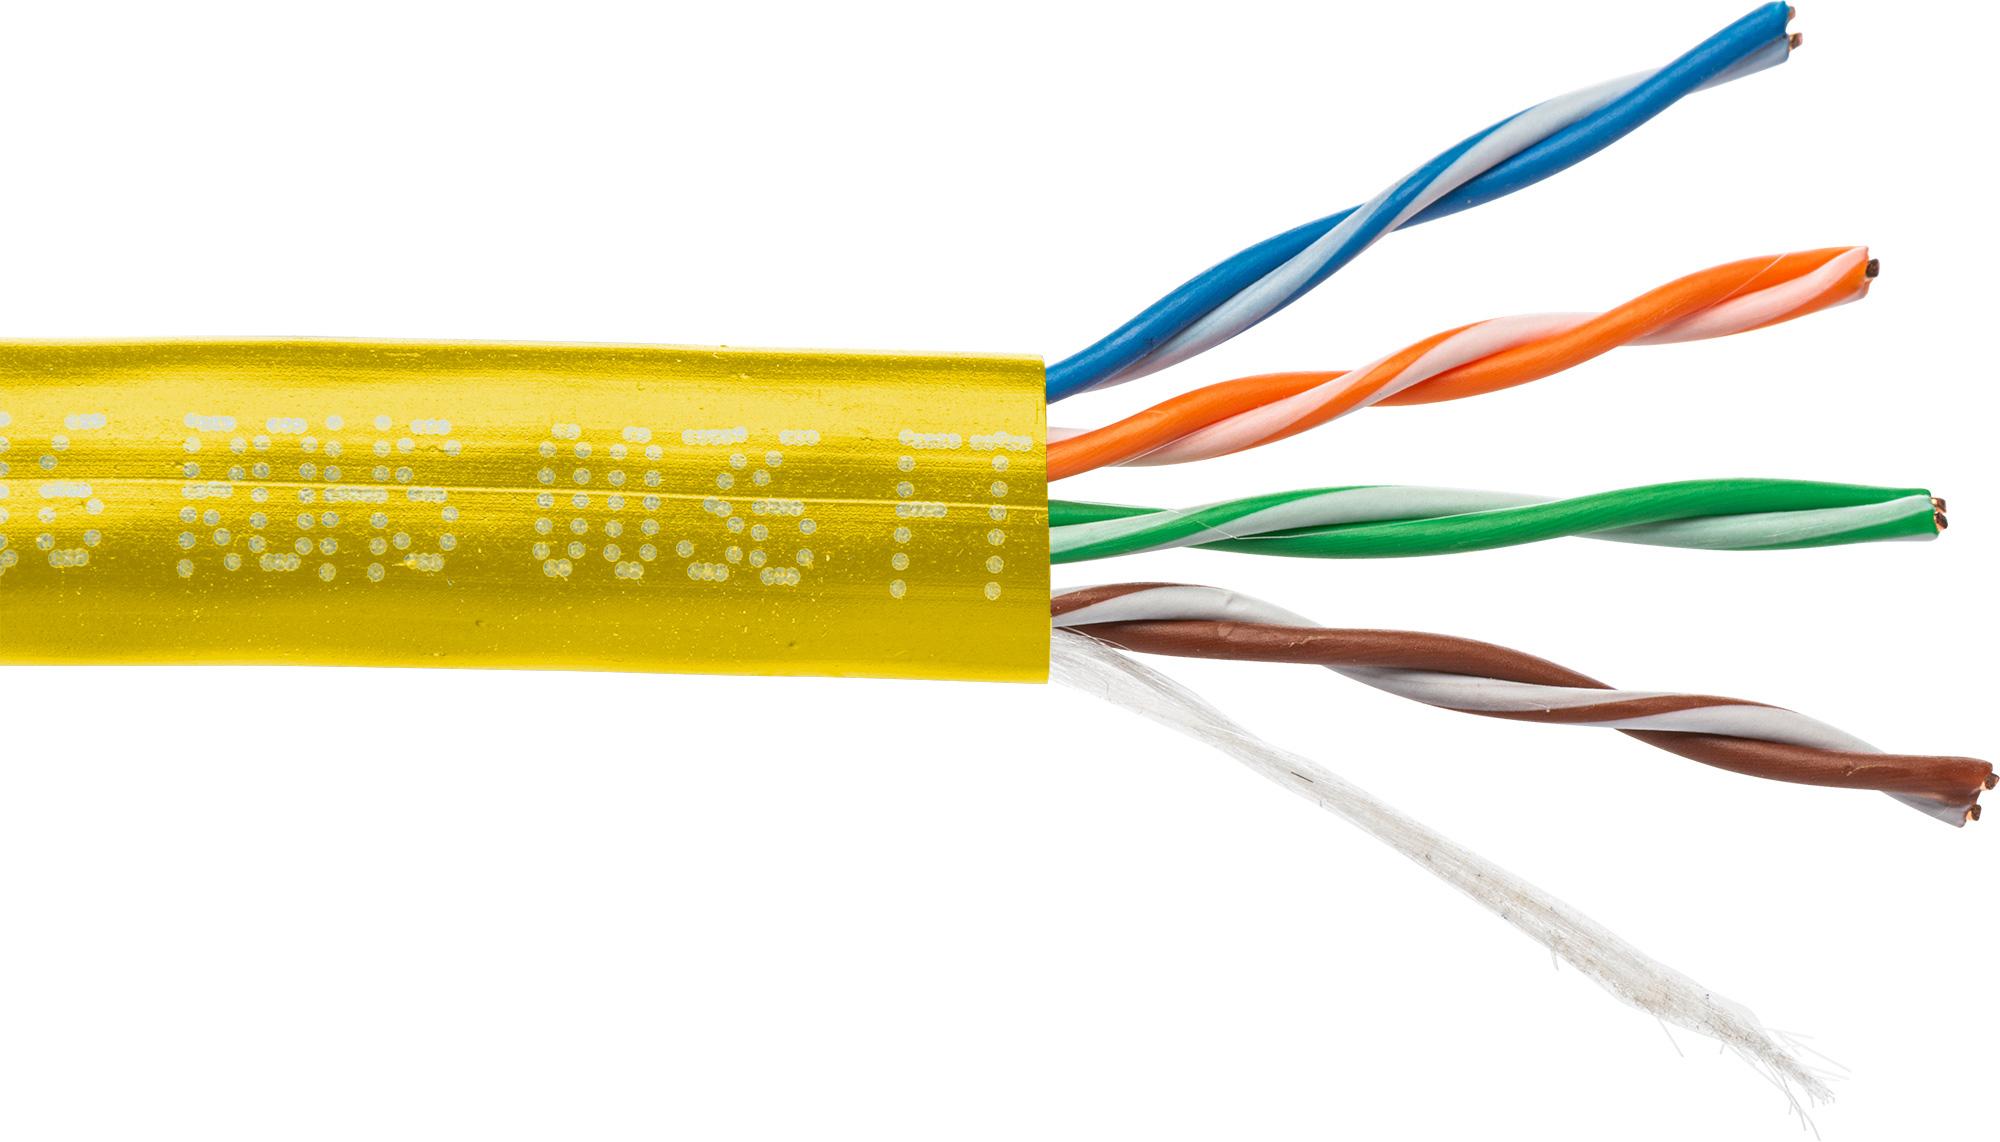 Belden Cat 6 Wiring Diagram - Wiring Diagram Data